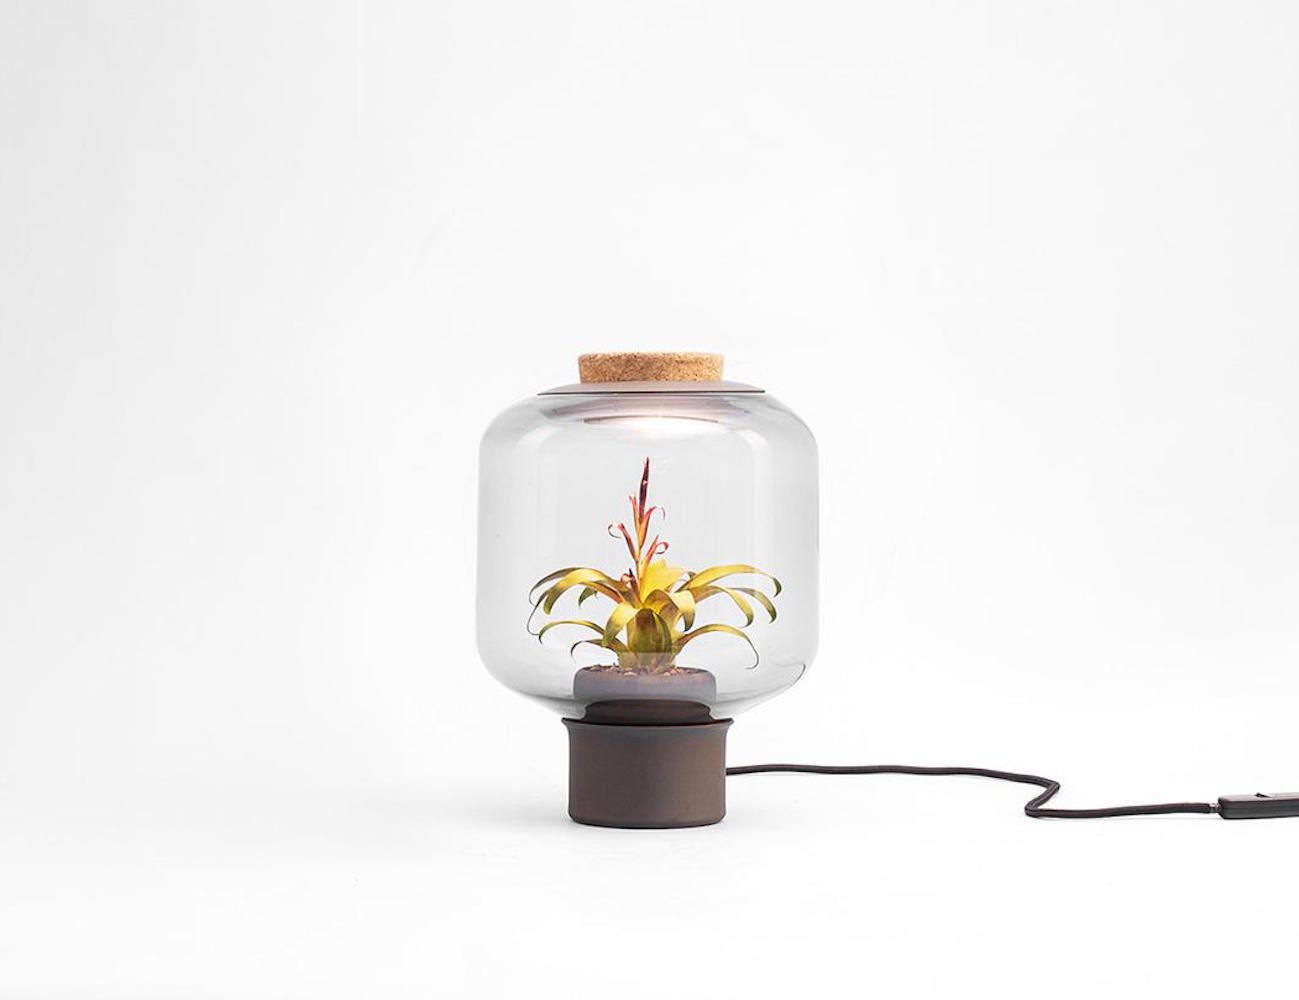 Lamp Mygdal by Nui Studio